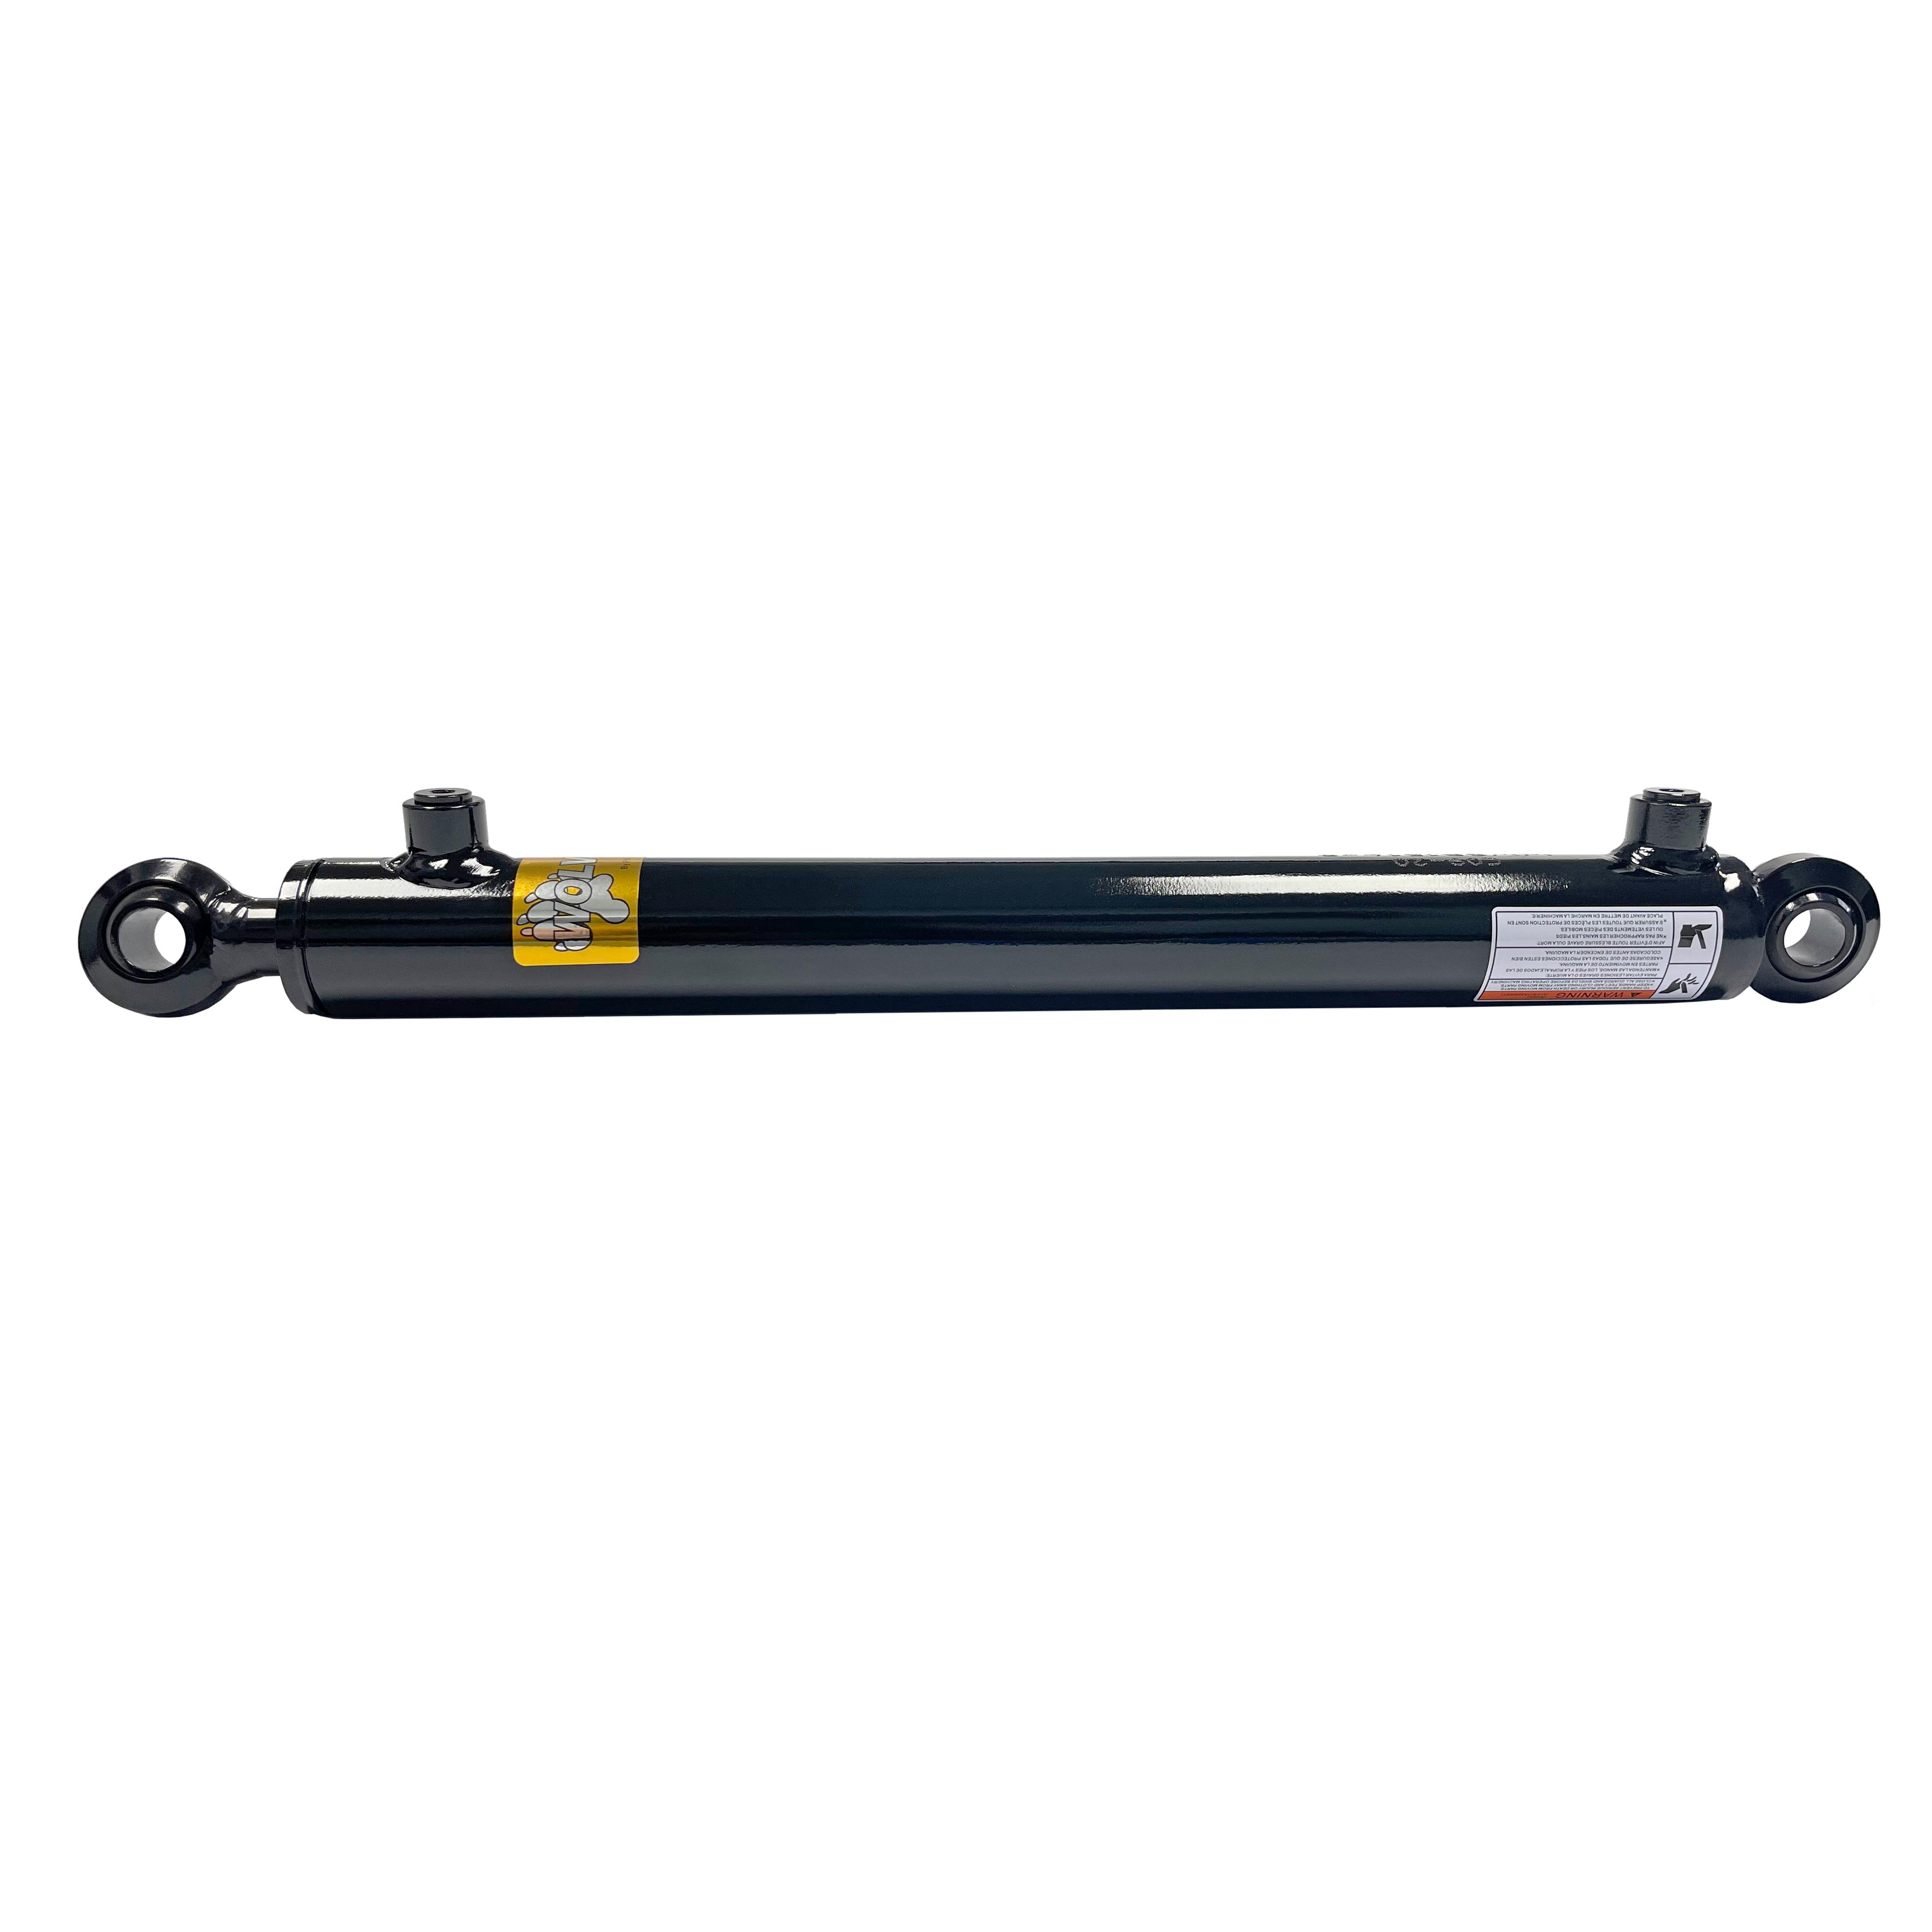 1 bore x 10 stroke swivel eye hydraulic cylinder, welded swivel eye double acting cylinder | Prince Hydraulics